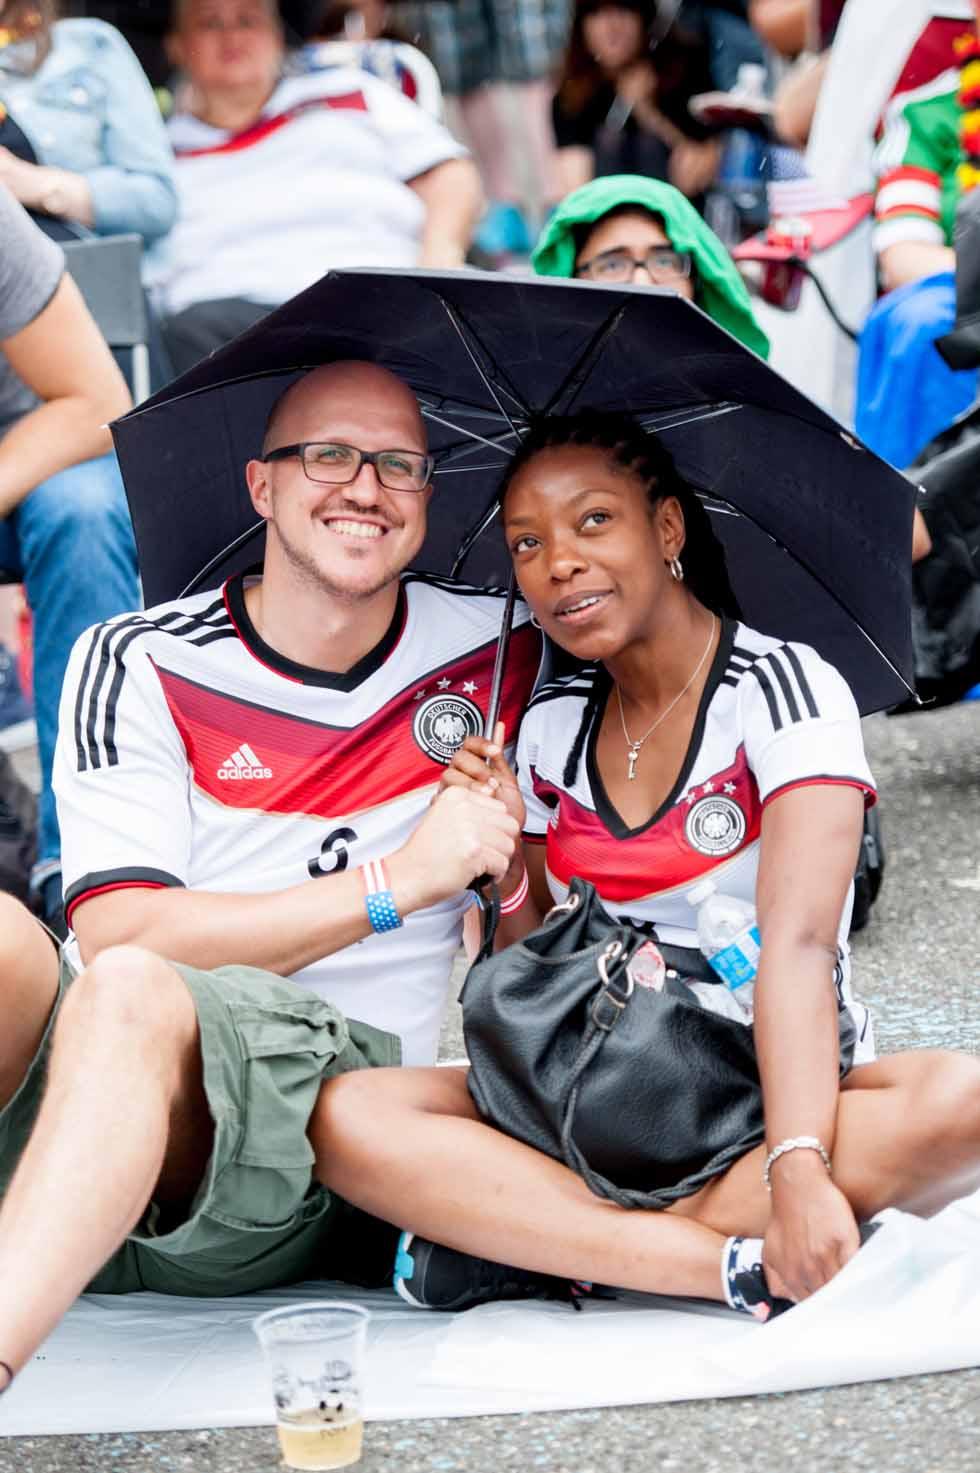 zum-schneider-nyc-2014-world-cup-germany-france-9482.jpg